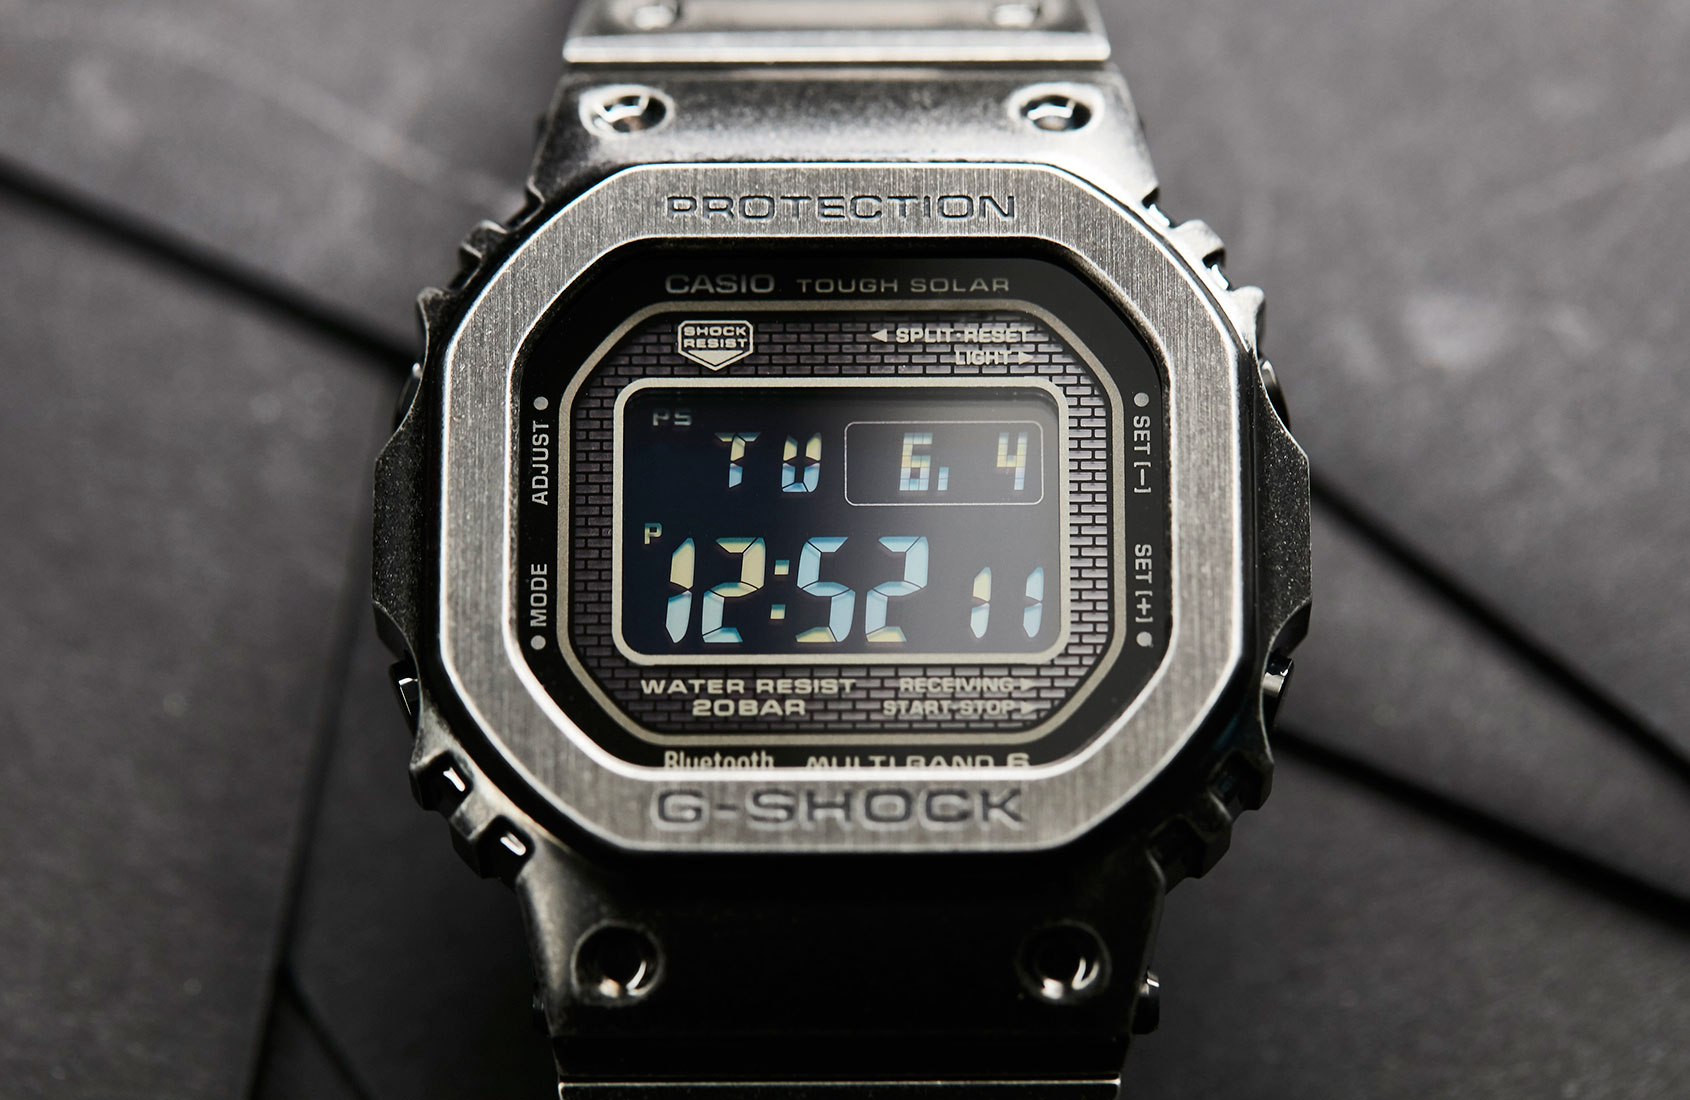 Gunmetal greatness with the Casio G-Shock GMW-B5000V